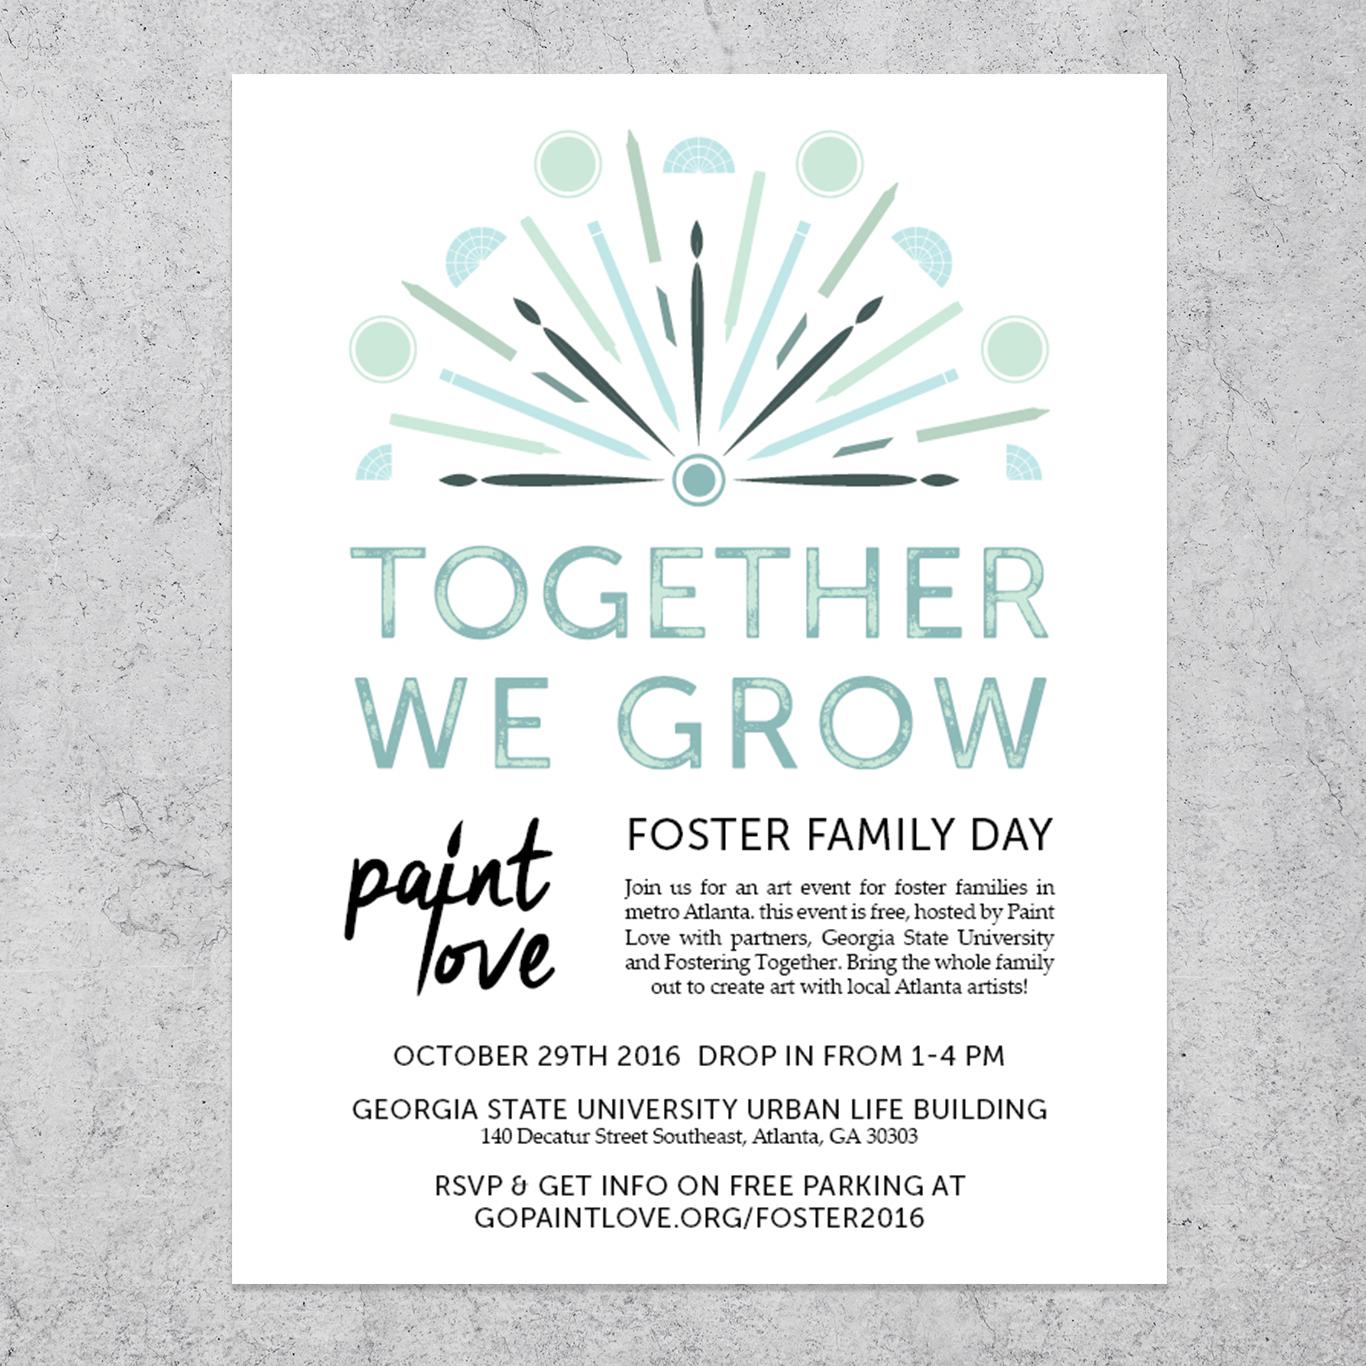 together-we-grow.jpg